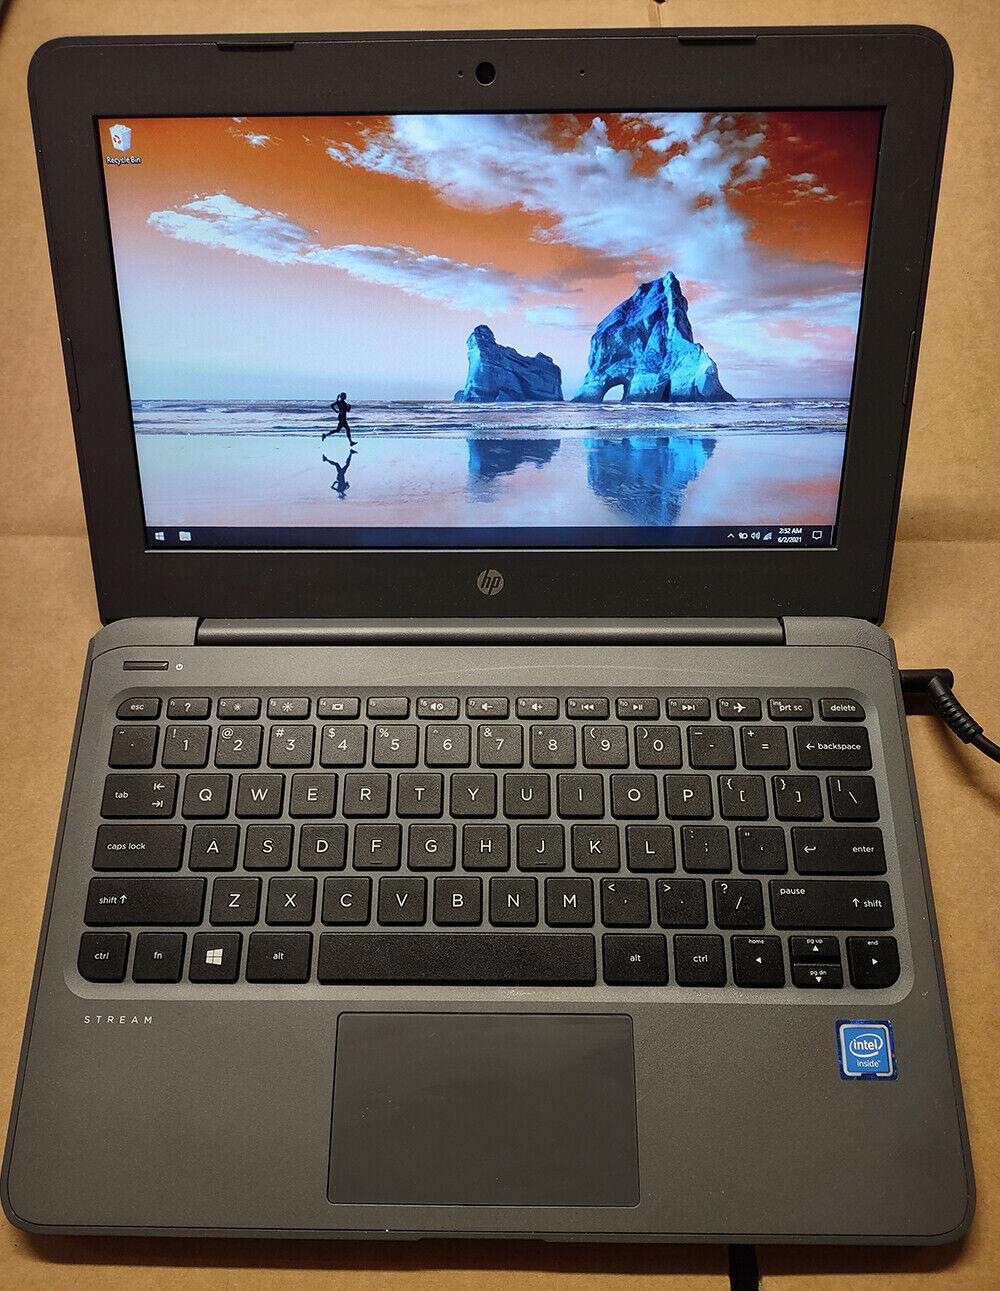 HP Stream ProBook 430 G4 Celeron N3350 1.10GHz 4GB RAM 64GB